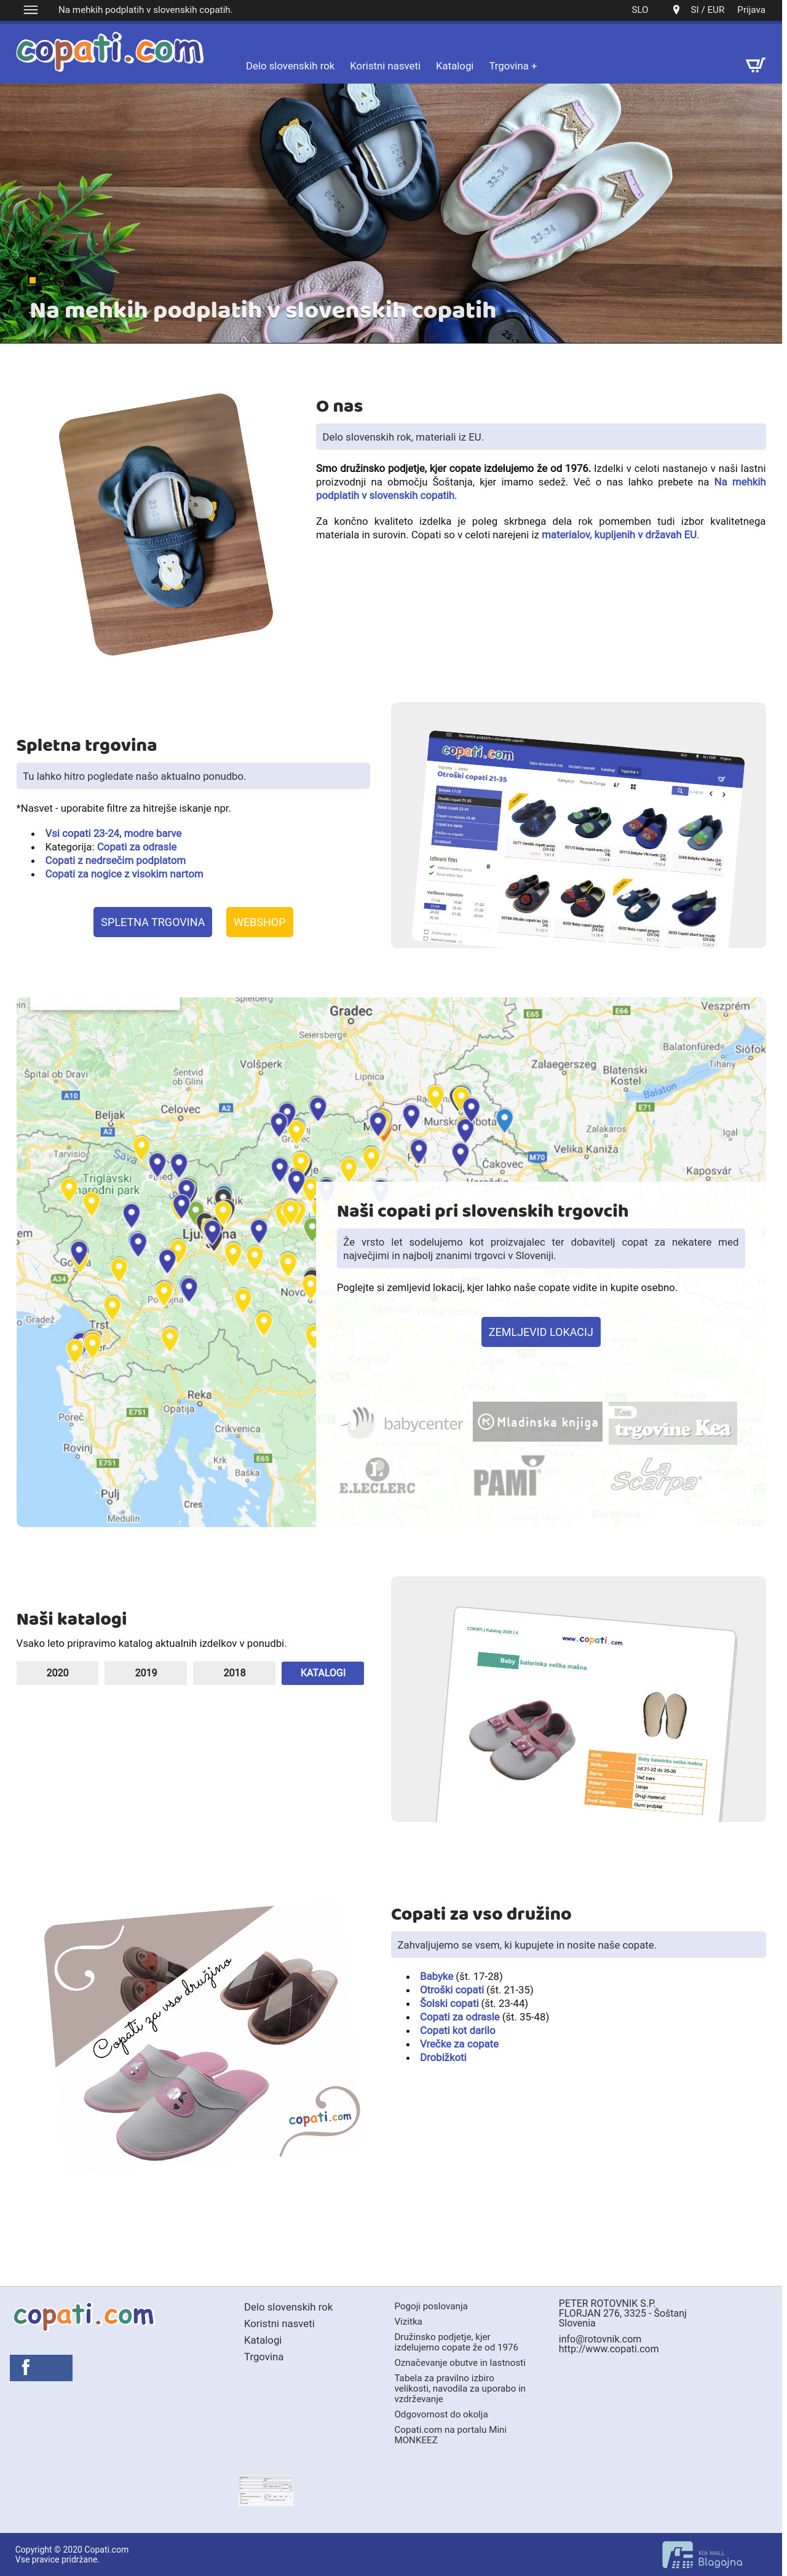 Prenova prve strani B2B/B2C spletne trgovine copati.com